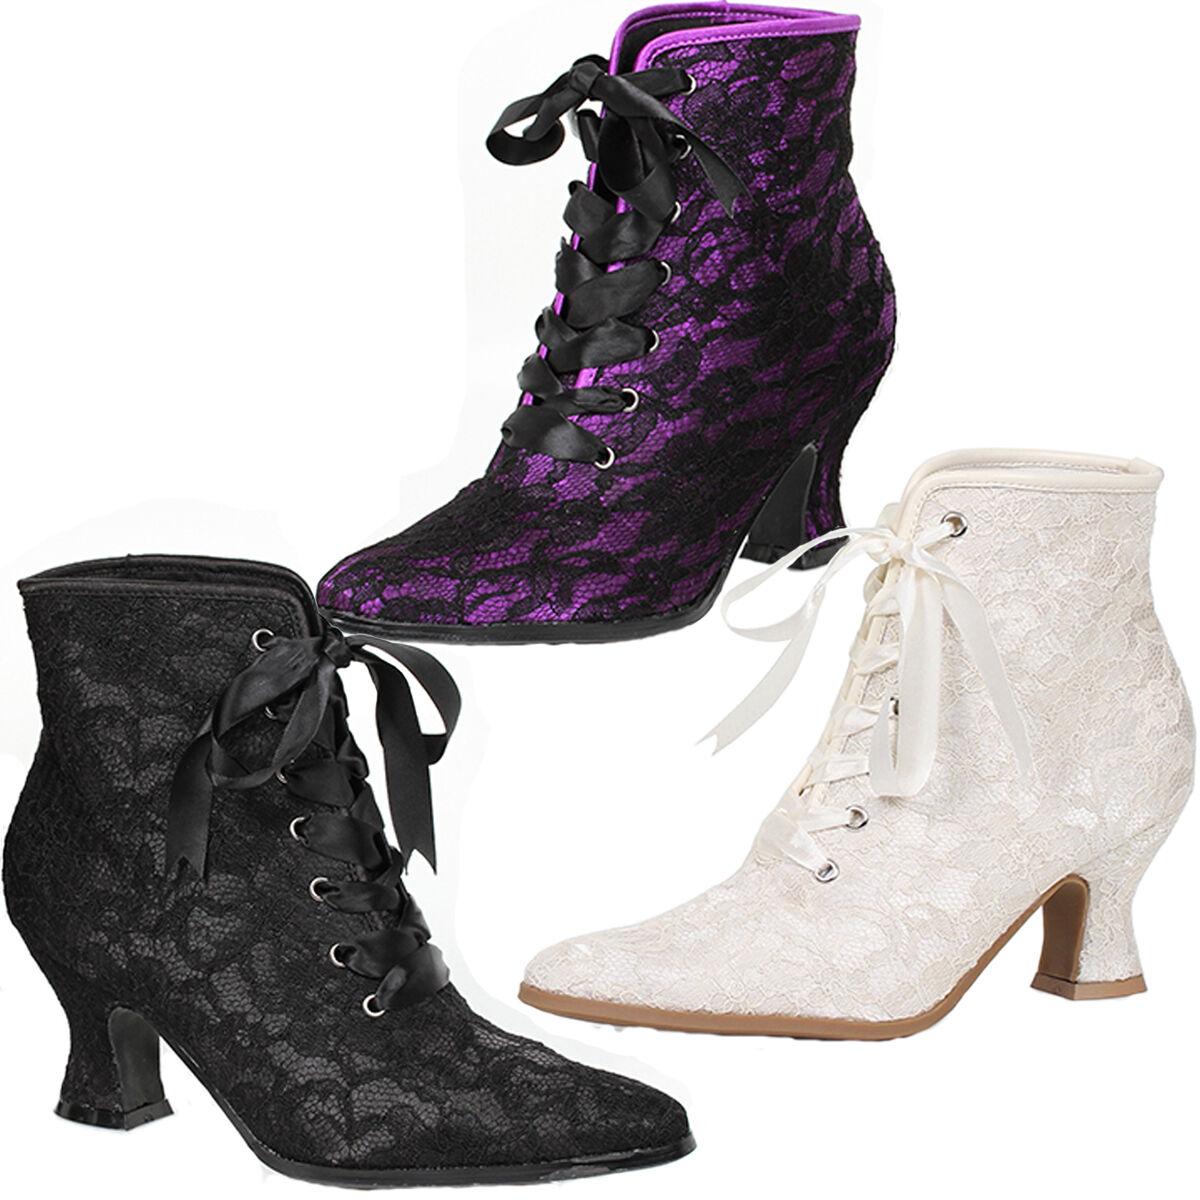 Granny Style Ankle Boots w 2.5  Heel Lace Overlay Sz 6-10 NIB 253-ELIZABETH